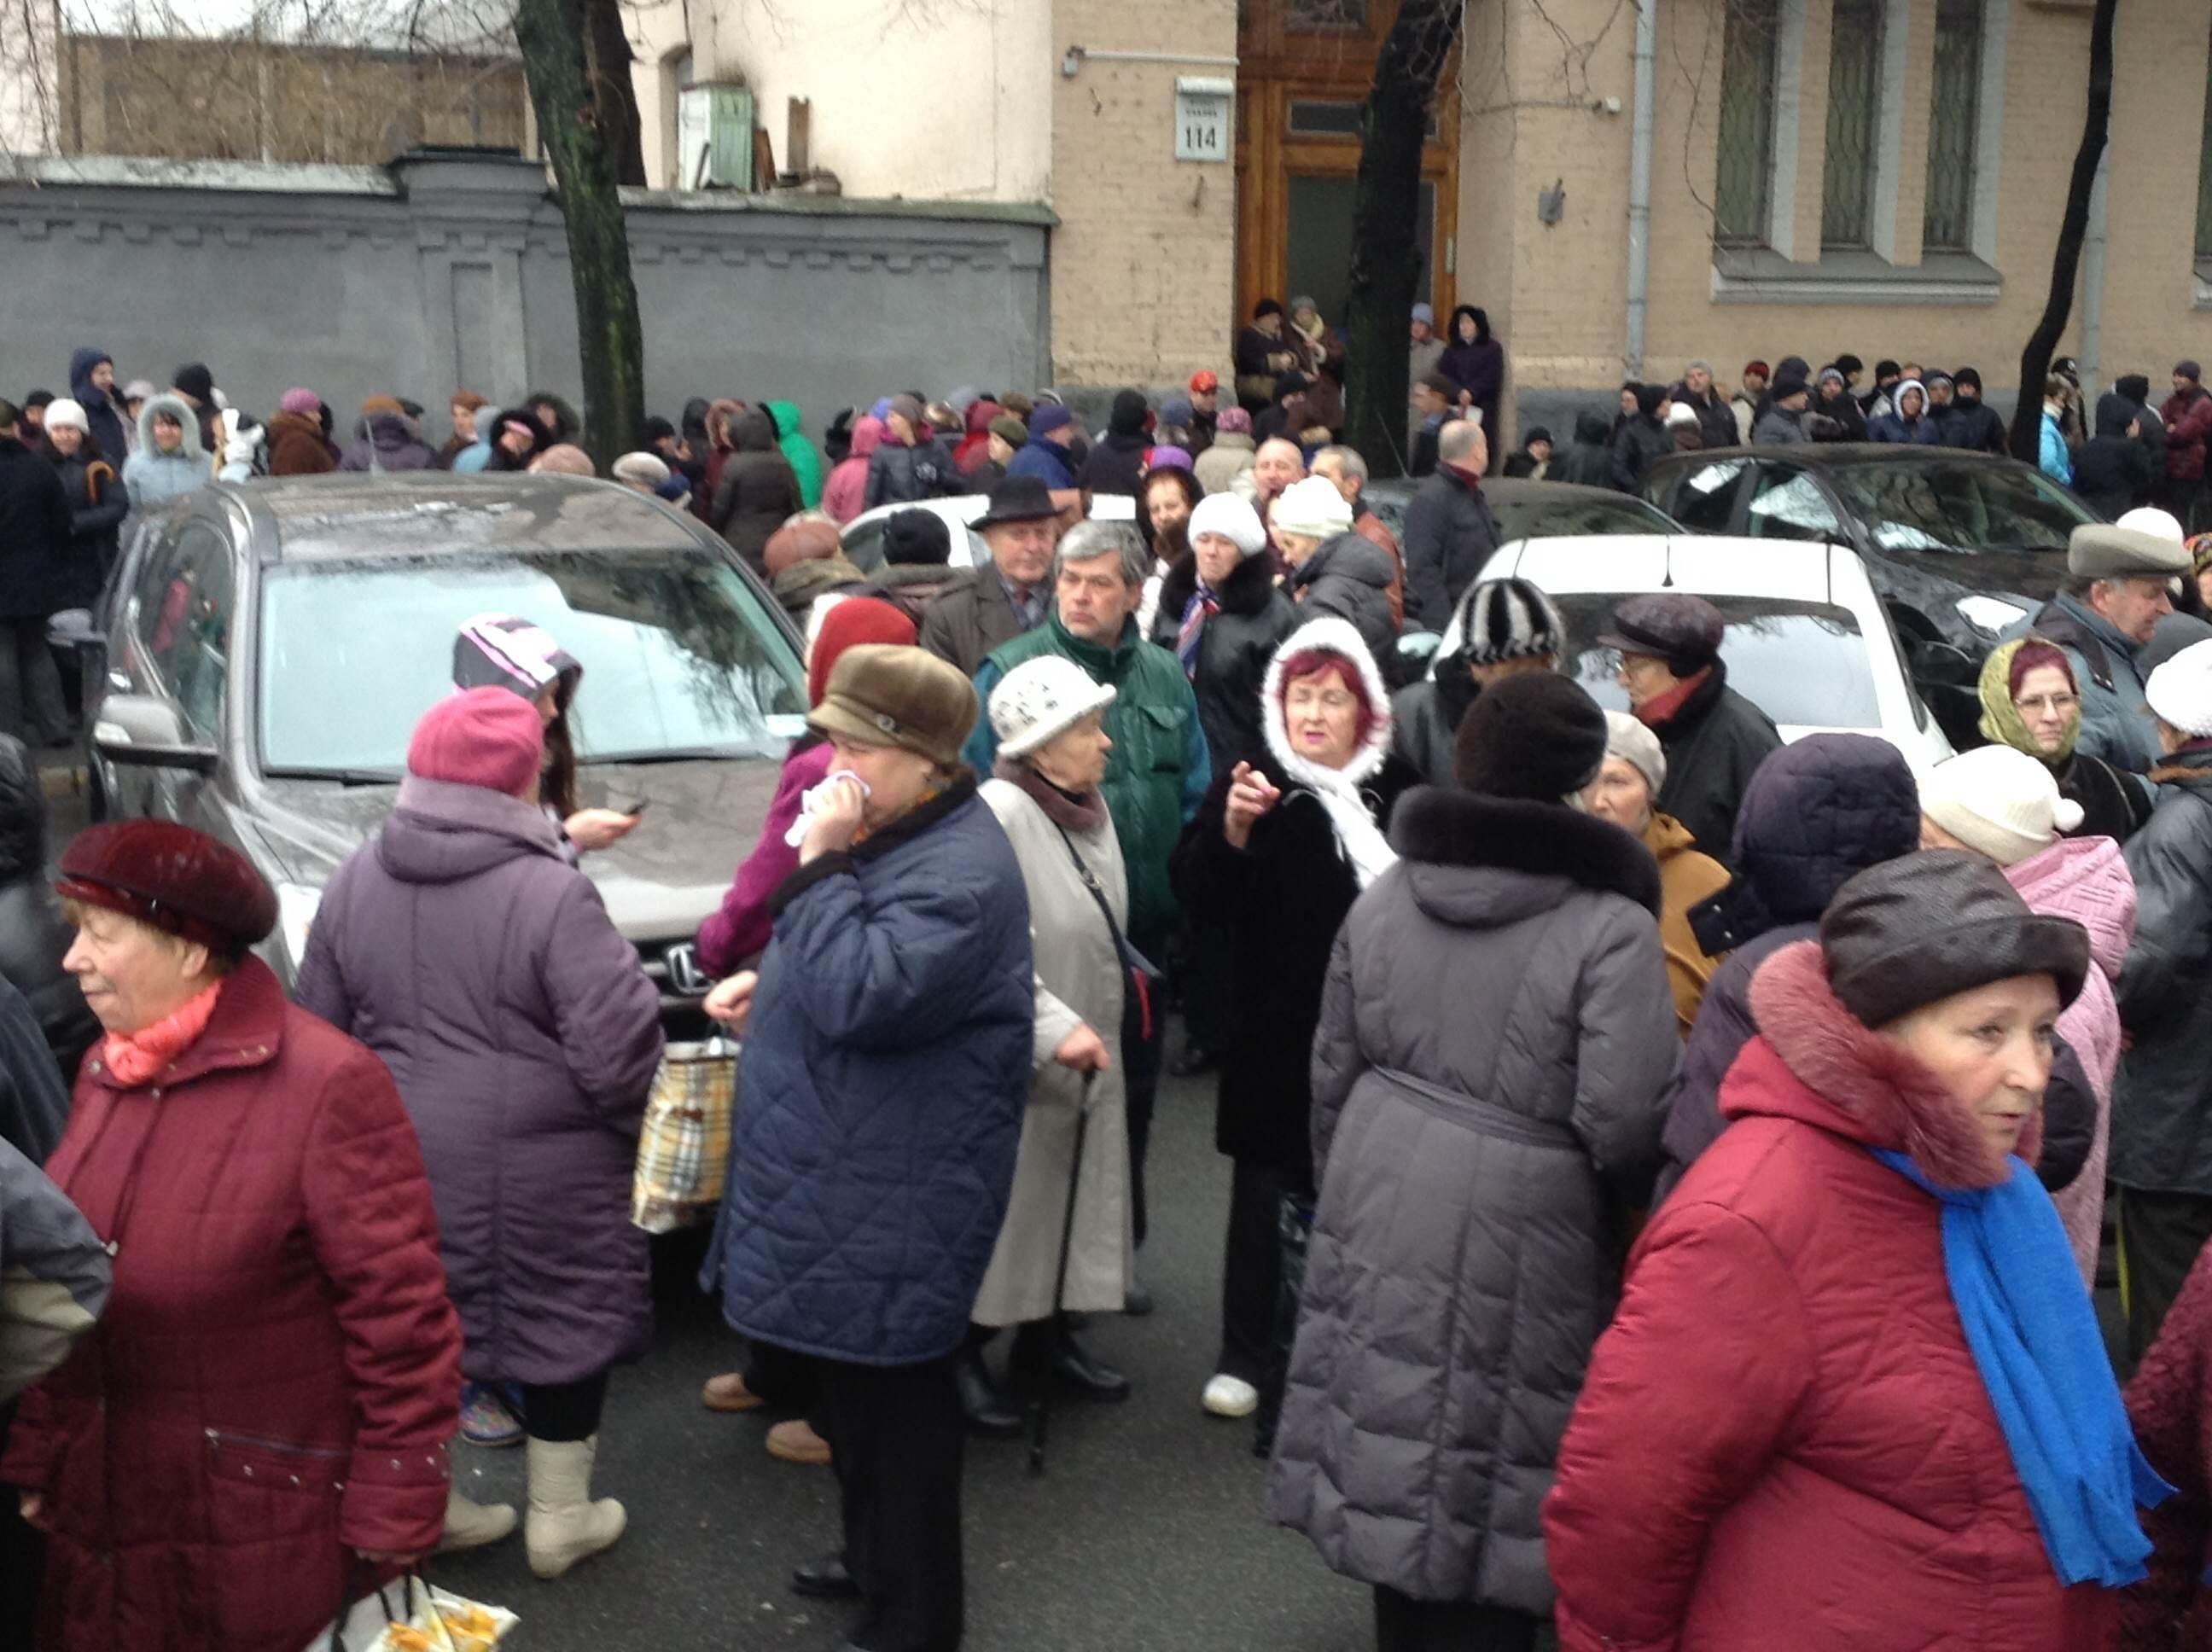 Митинги в центре Киева. Март 2015. Фото: ostro.org